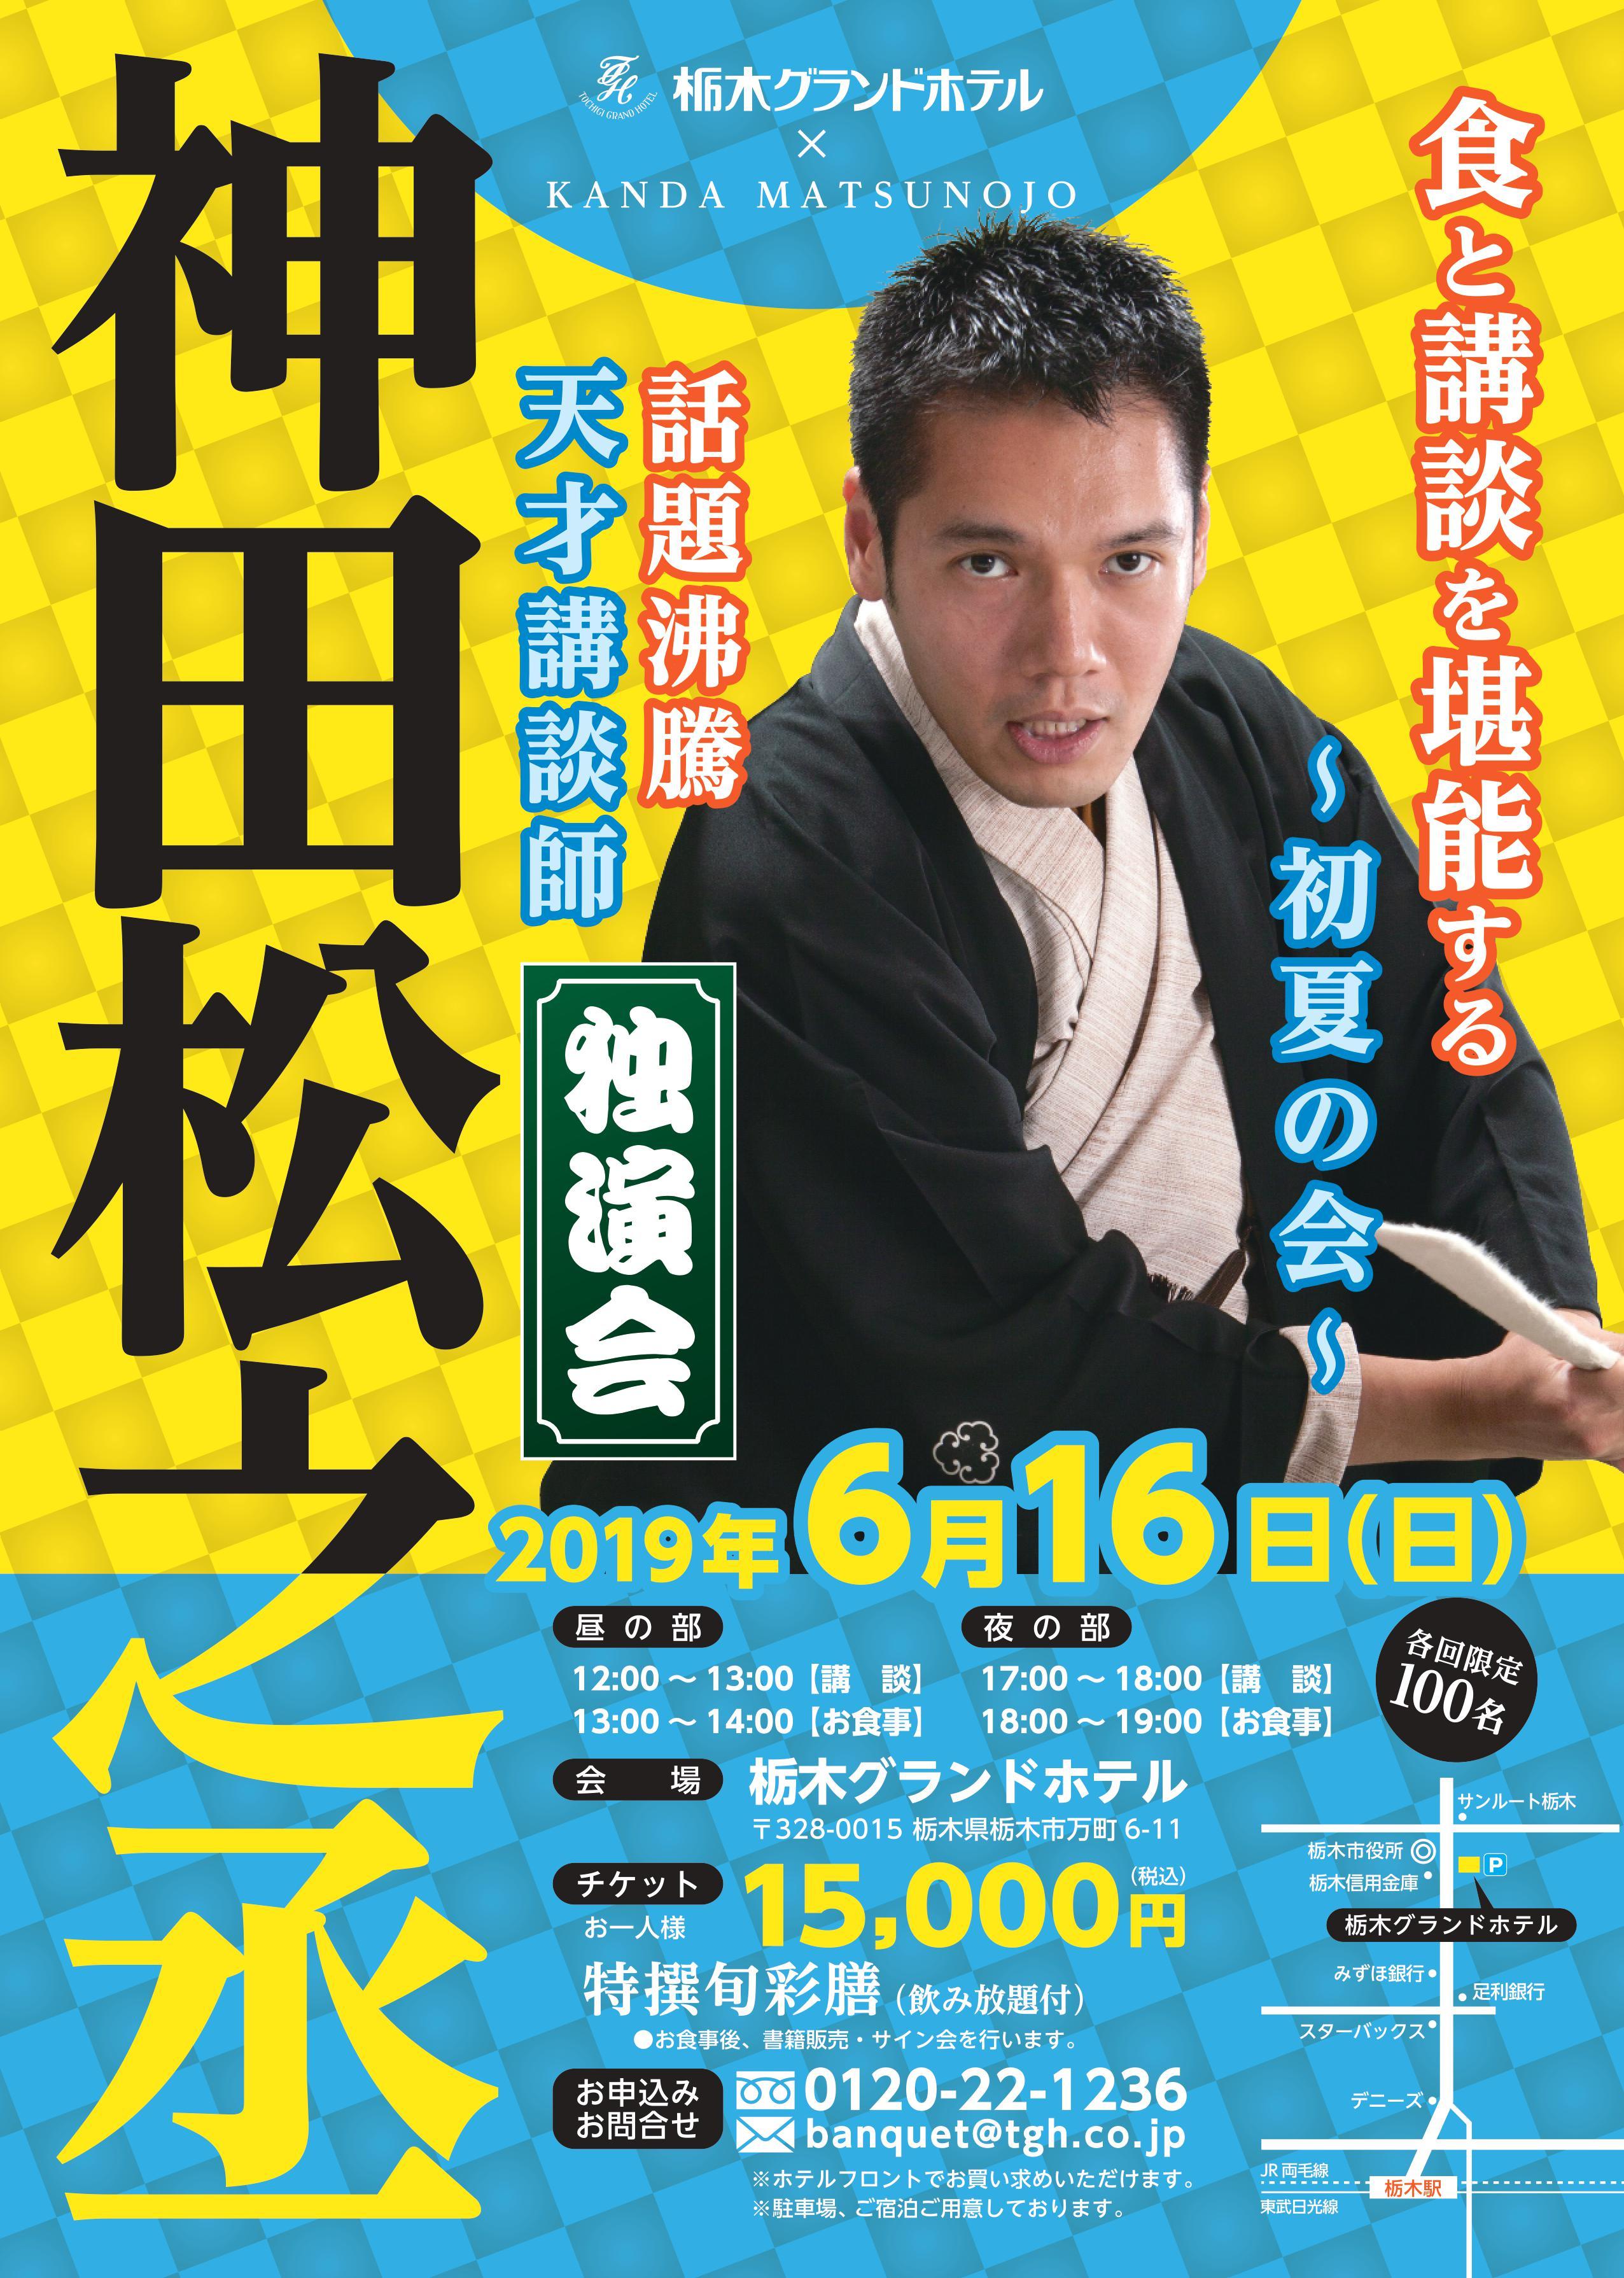 http://www.tgh.co.jp/contents/news/0001.jpg